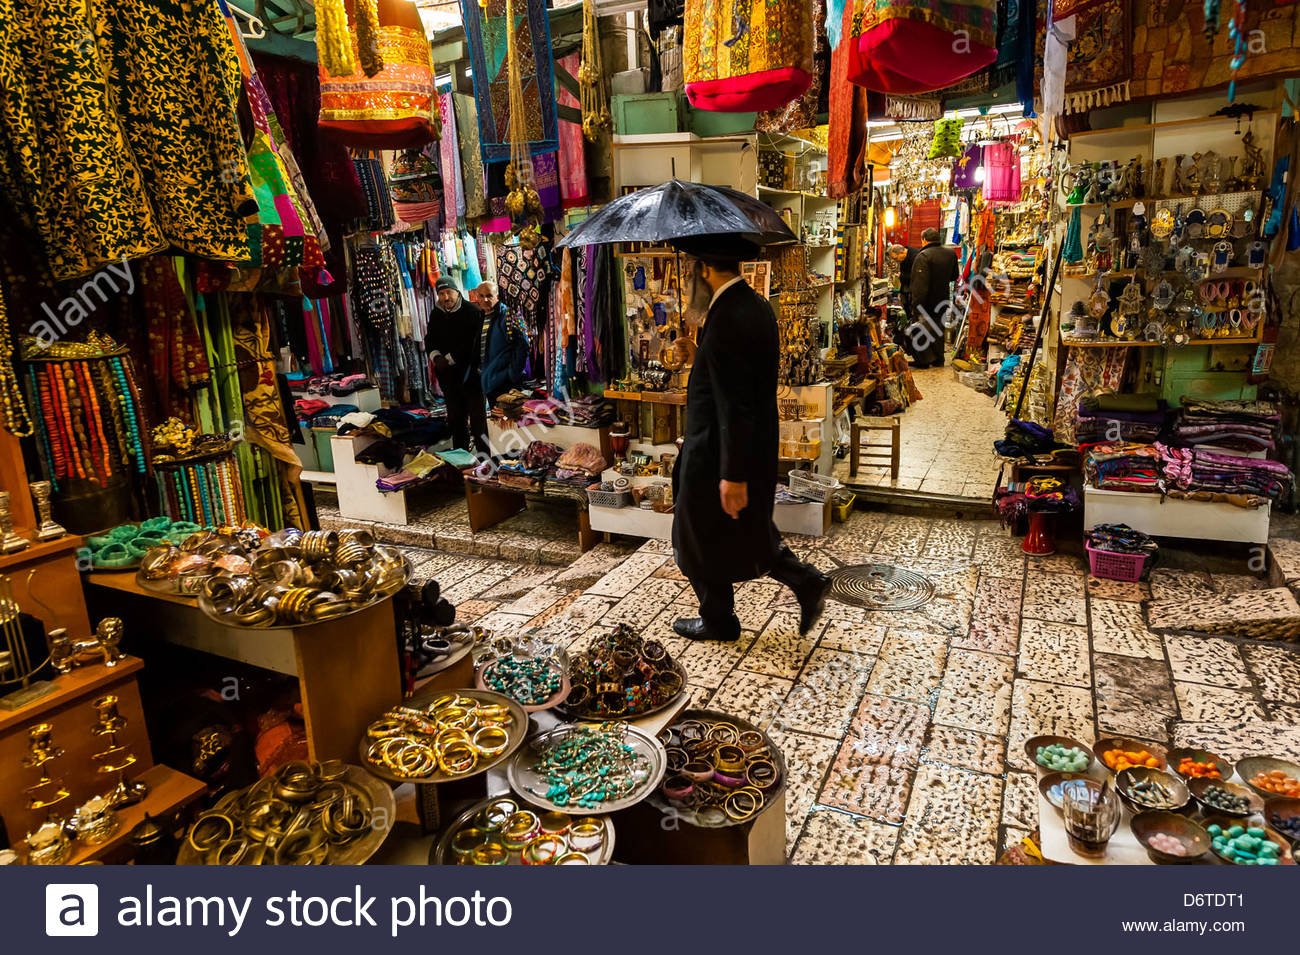 An orthodox Jew walking through the Arab bazaar (suq) in the old city of Jerusalem, Israel in the rain. - Stock Image